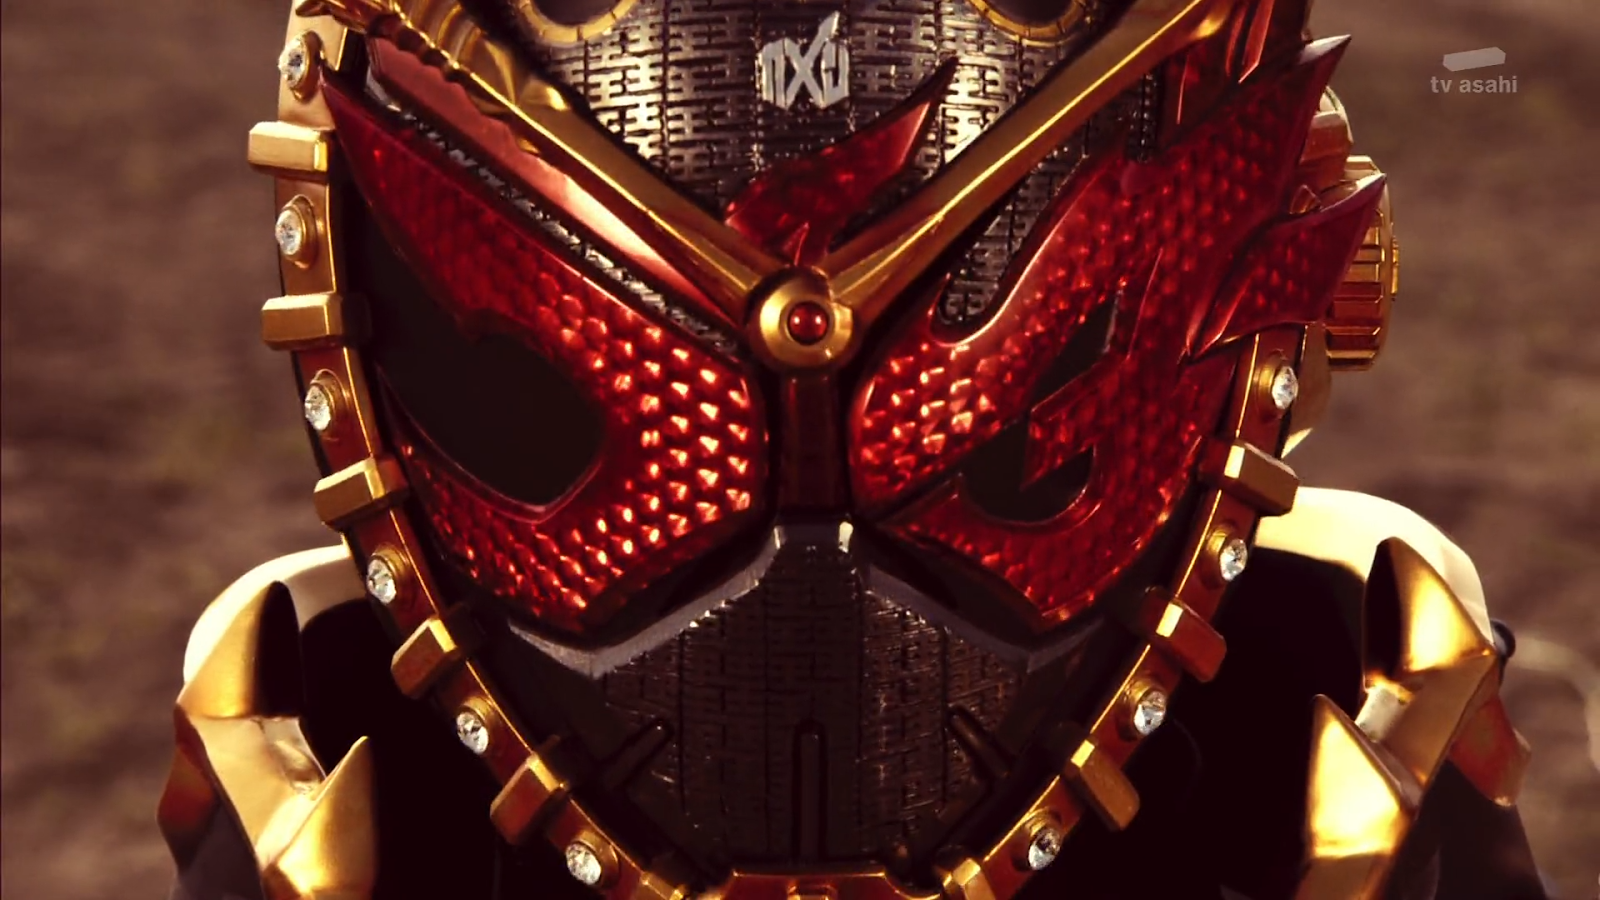 Emerald Rangers: Kamen Rider Zi-O! Episode 1 - Kingdom 2068 Summary